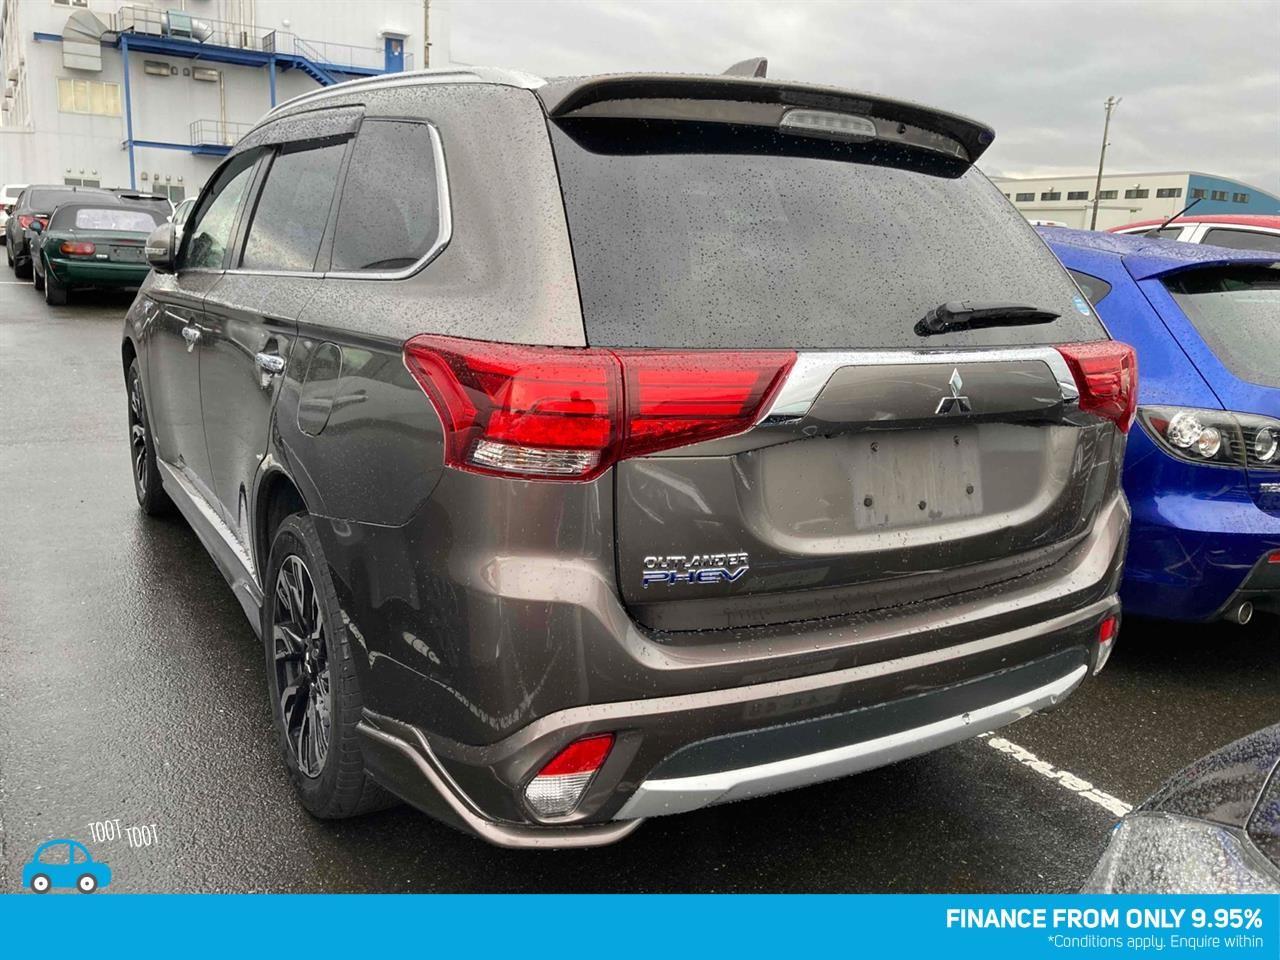 image-1, 2016 Mitsubishi OUTLANDER PHEV Facelift at Dunedin